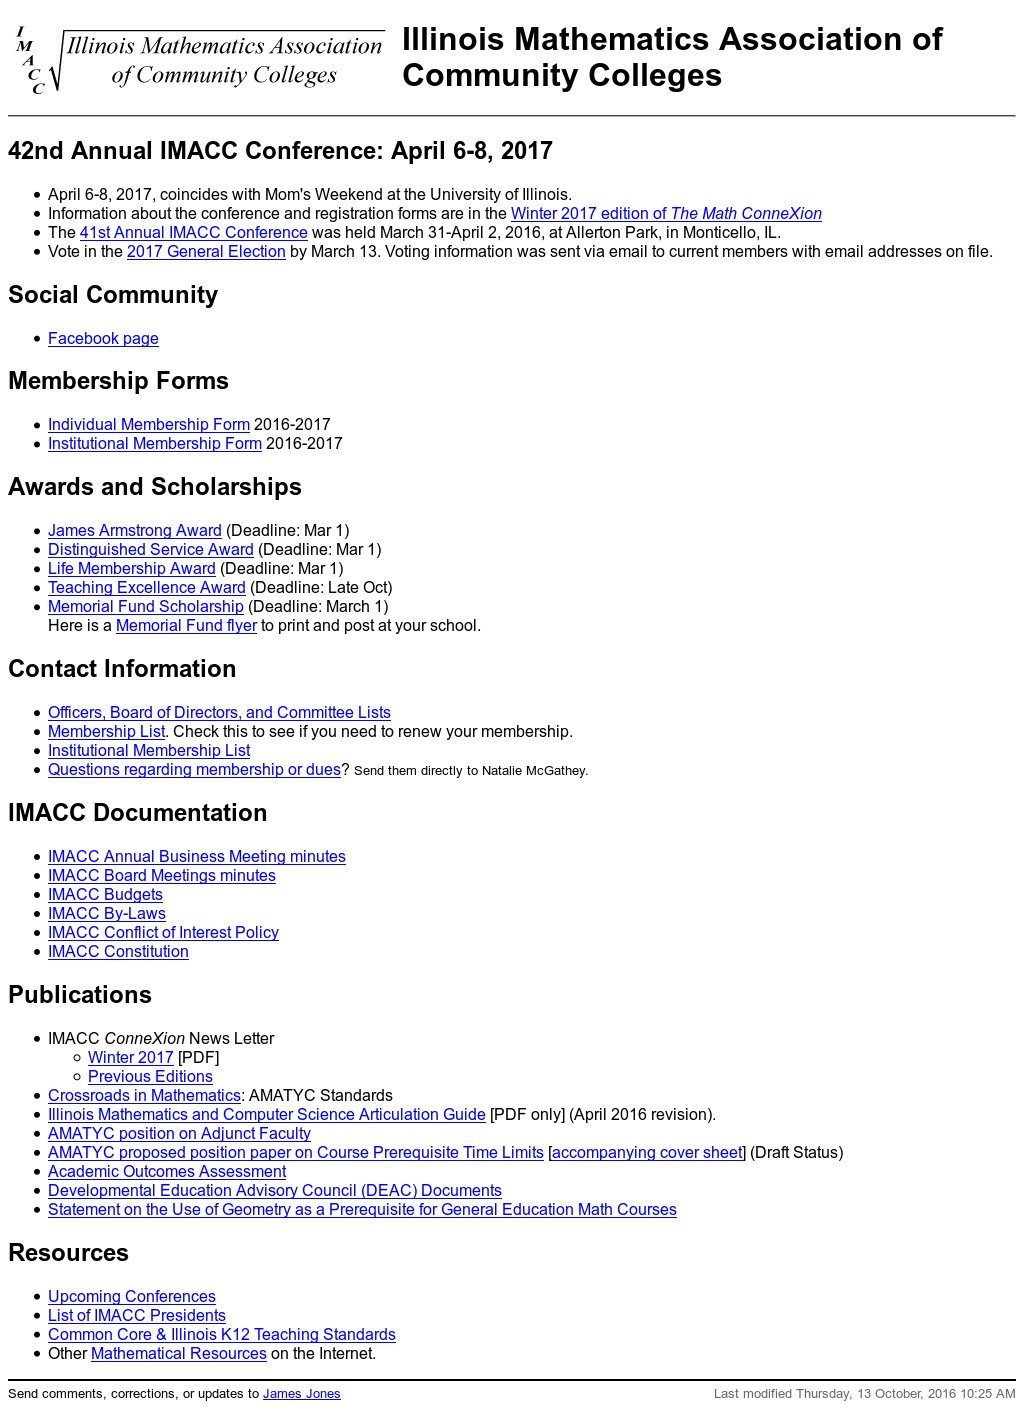 Illinois Mathematics Association of Community Colleges